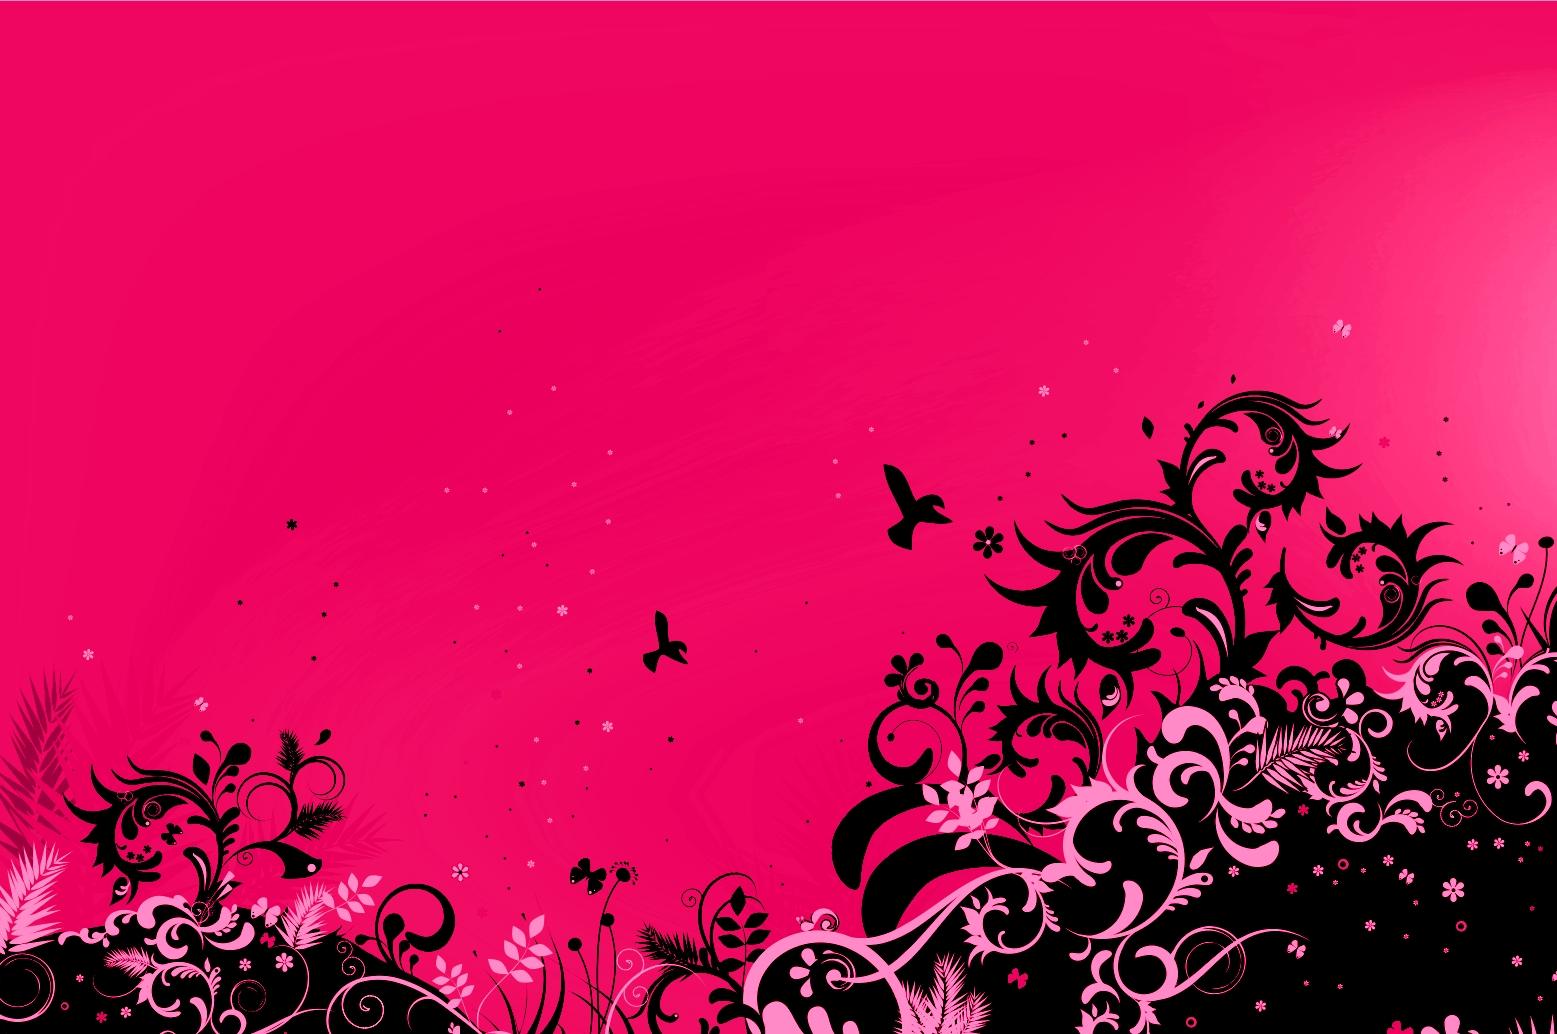 Pink HD Wallpapers HQ Wallpapers   Wallpapers HQ Wallpaper 1557x1034